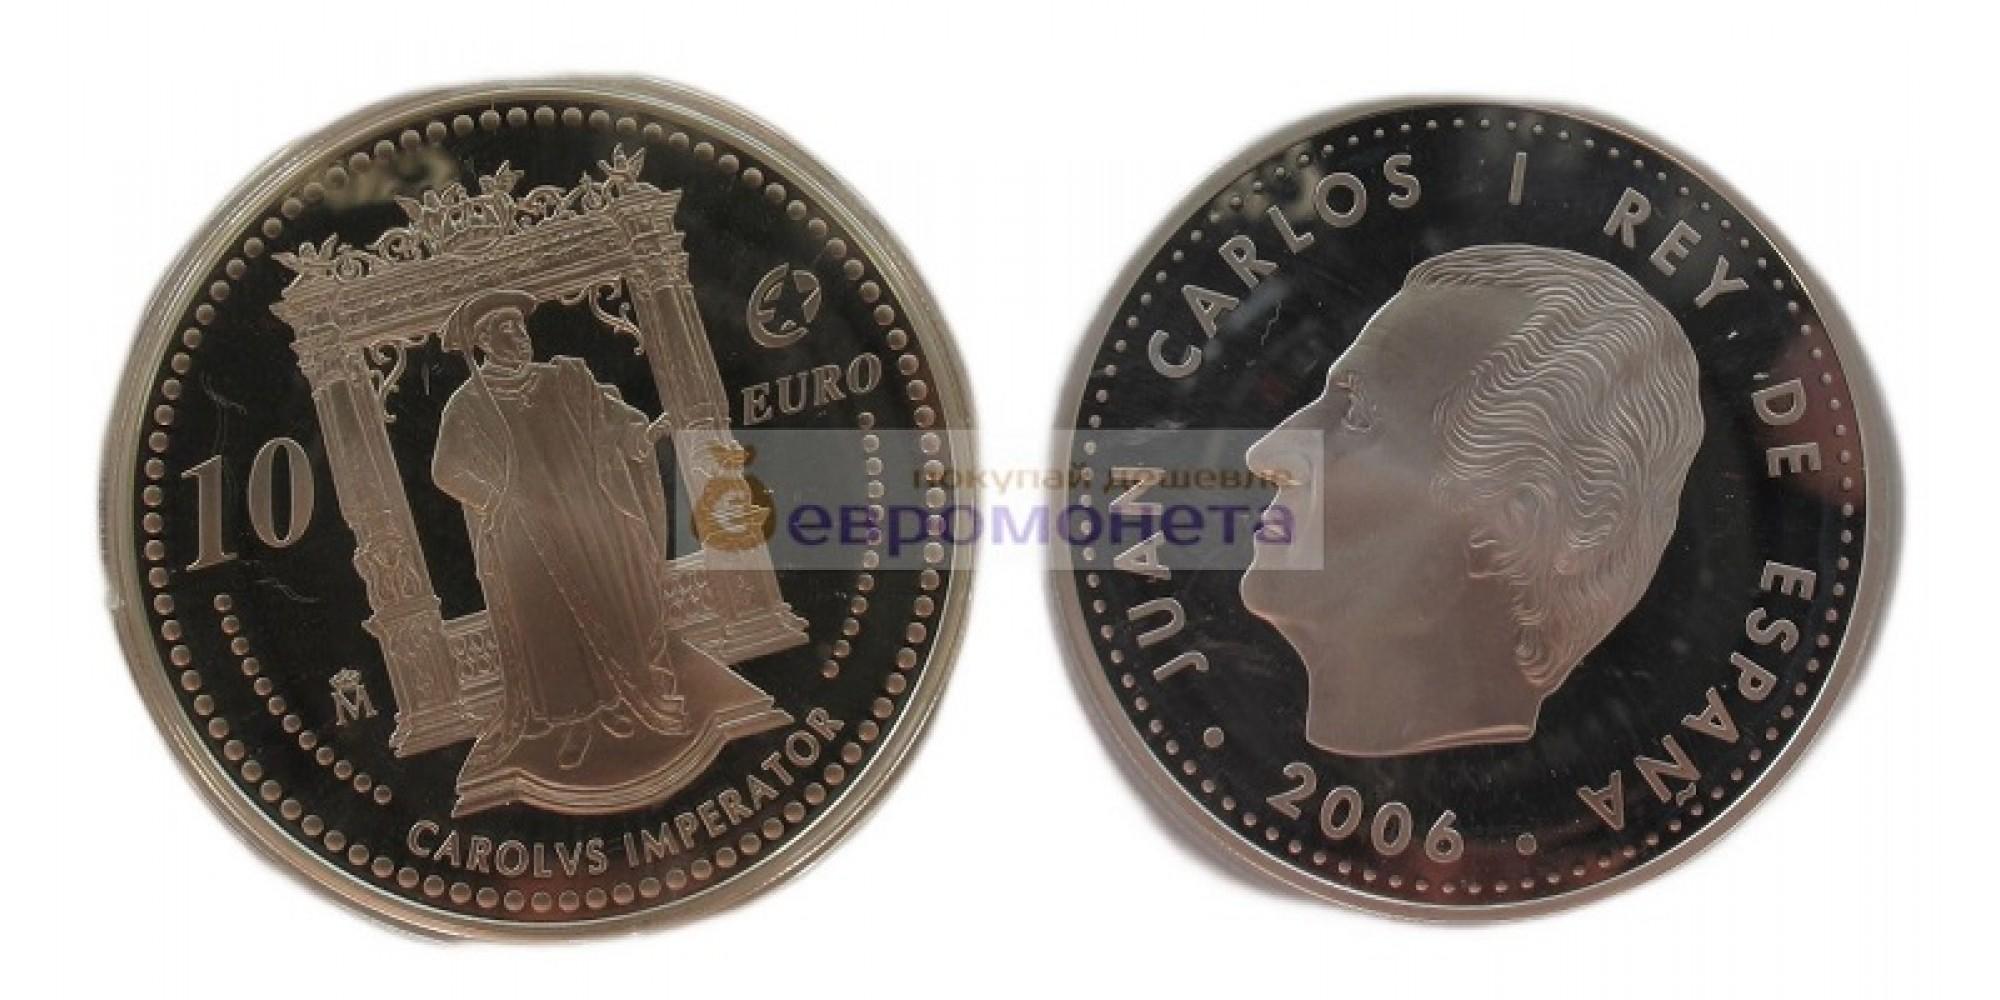 Испания 10 евро 2006 год 450 лет со дня смерти Карла V. Серебро. Пруф (Proof )